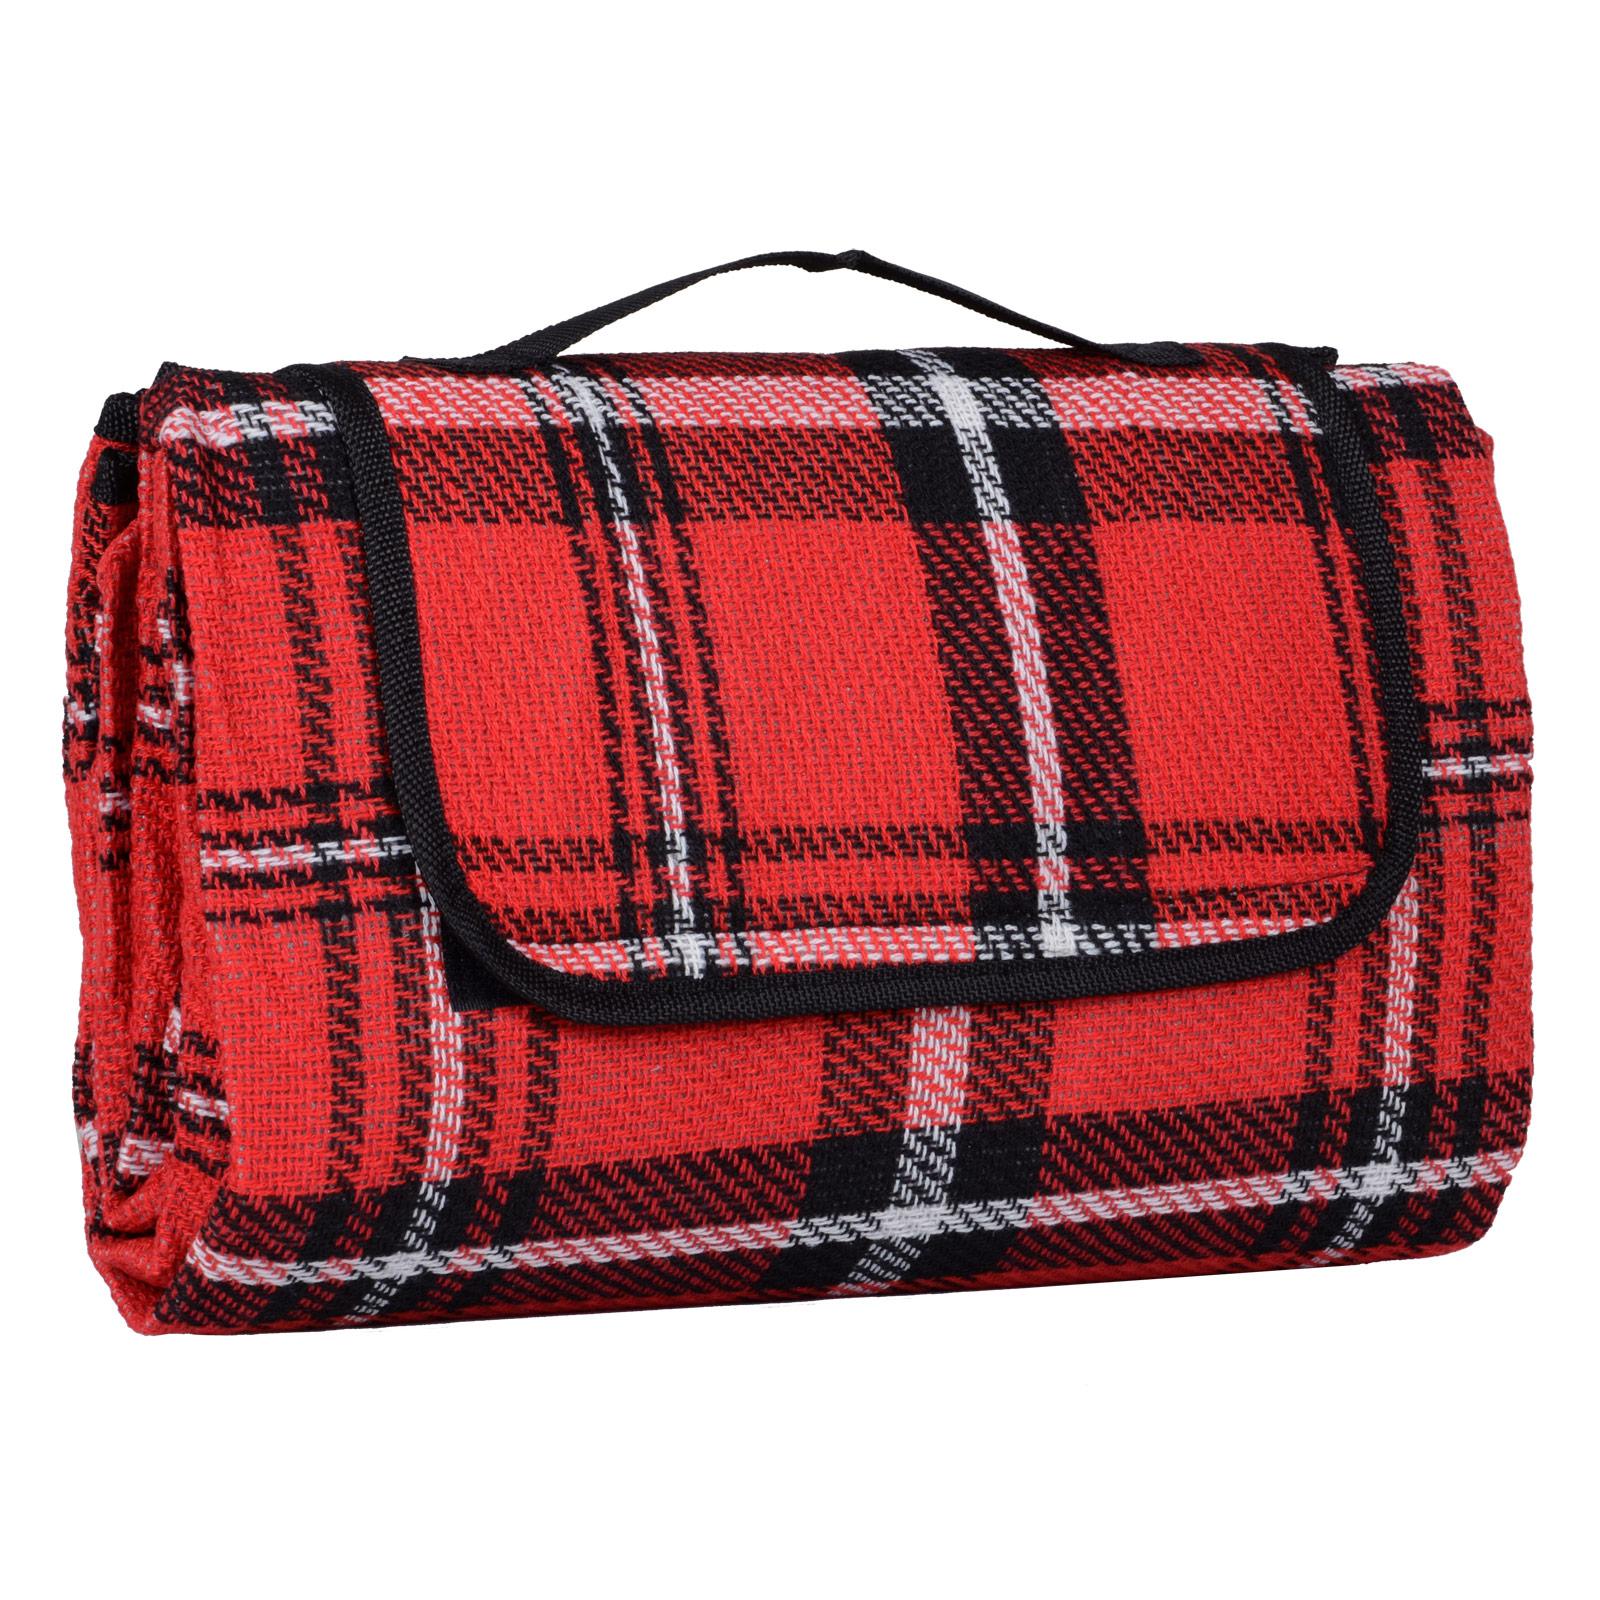 "Picnic Blanket: New Large 59x51"" Outdoor Waterproof Picnic Blanket Beach"